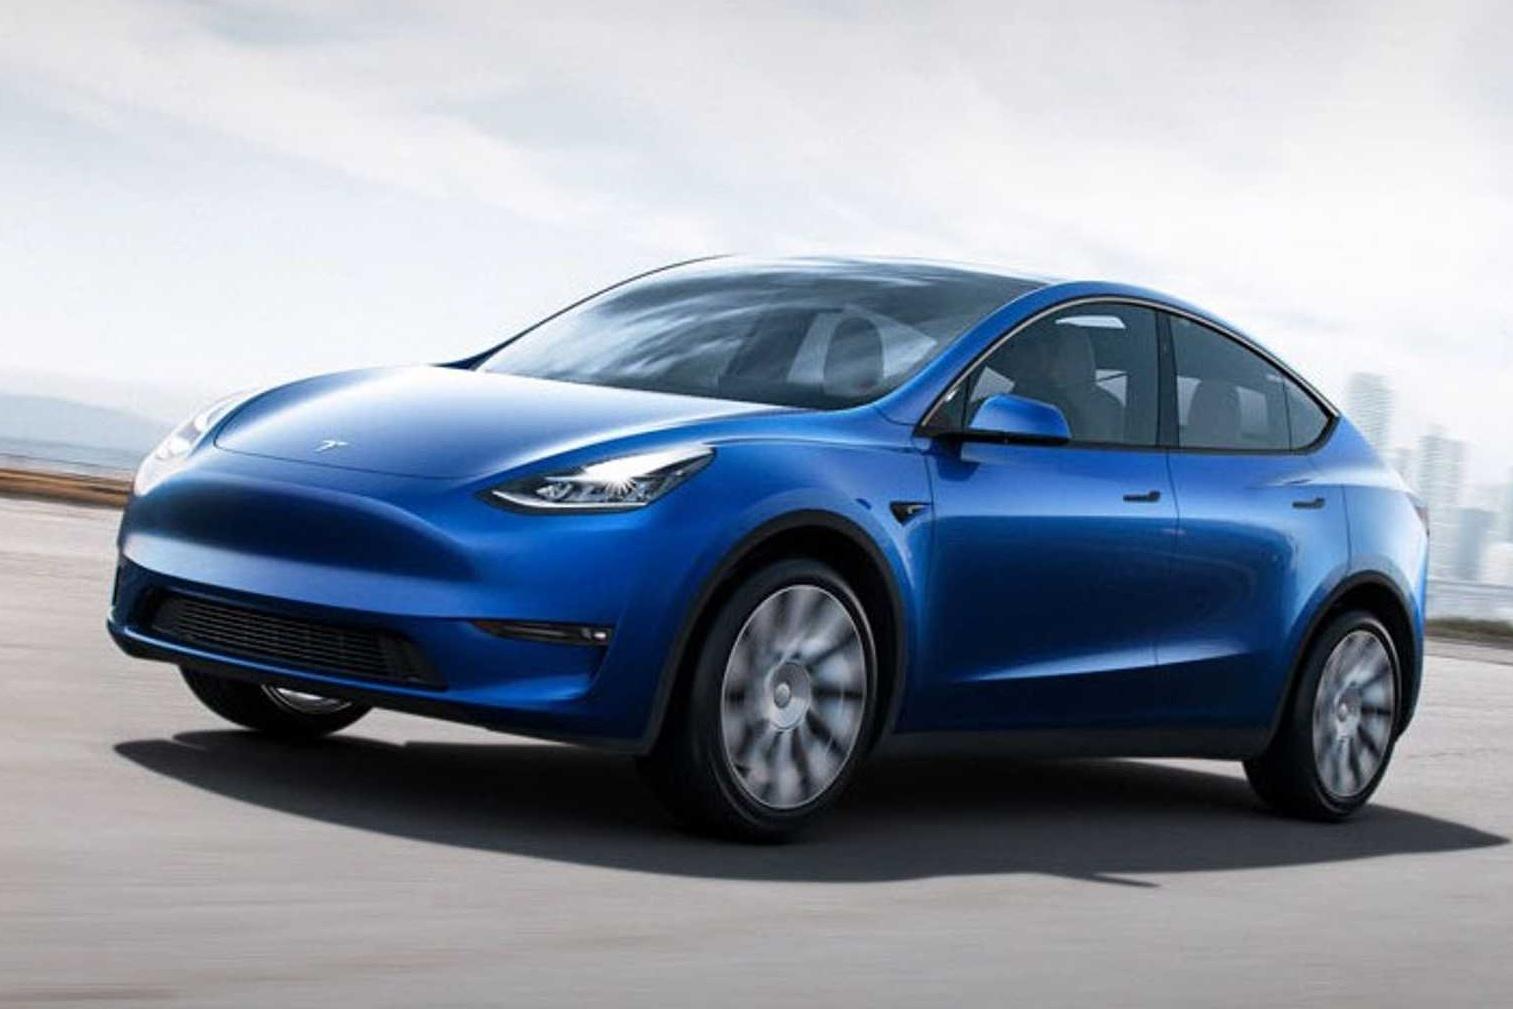 Tesla Model Y ครอสส์โอเวอร์พลังงานไฟฟ้า ขนาดกะทัดรัด หลาก